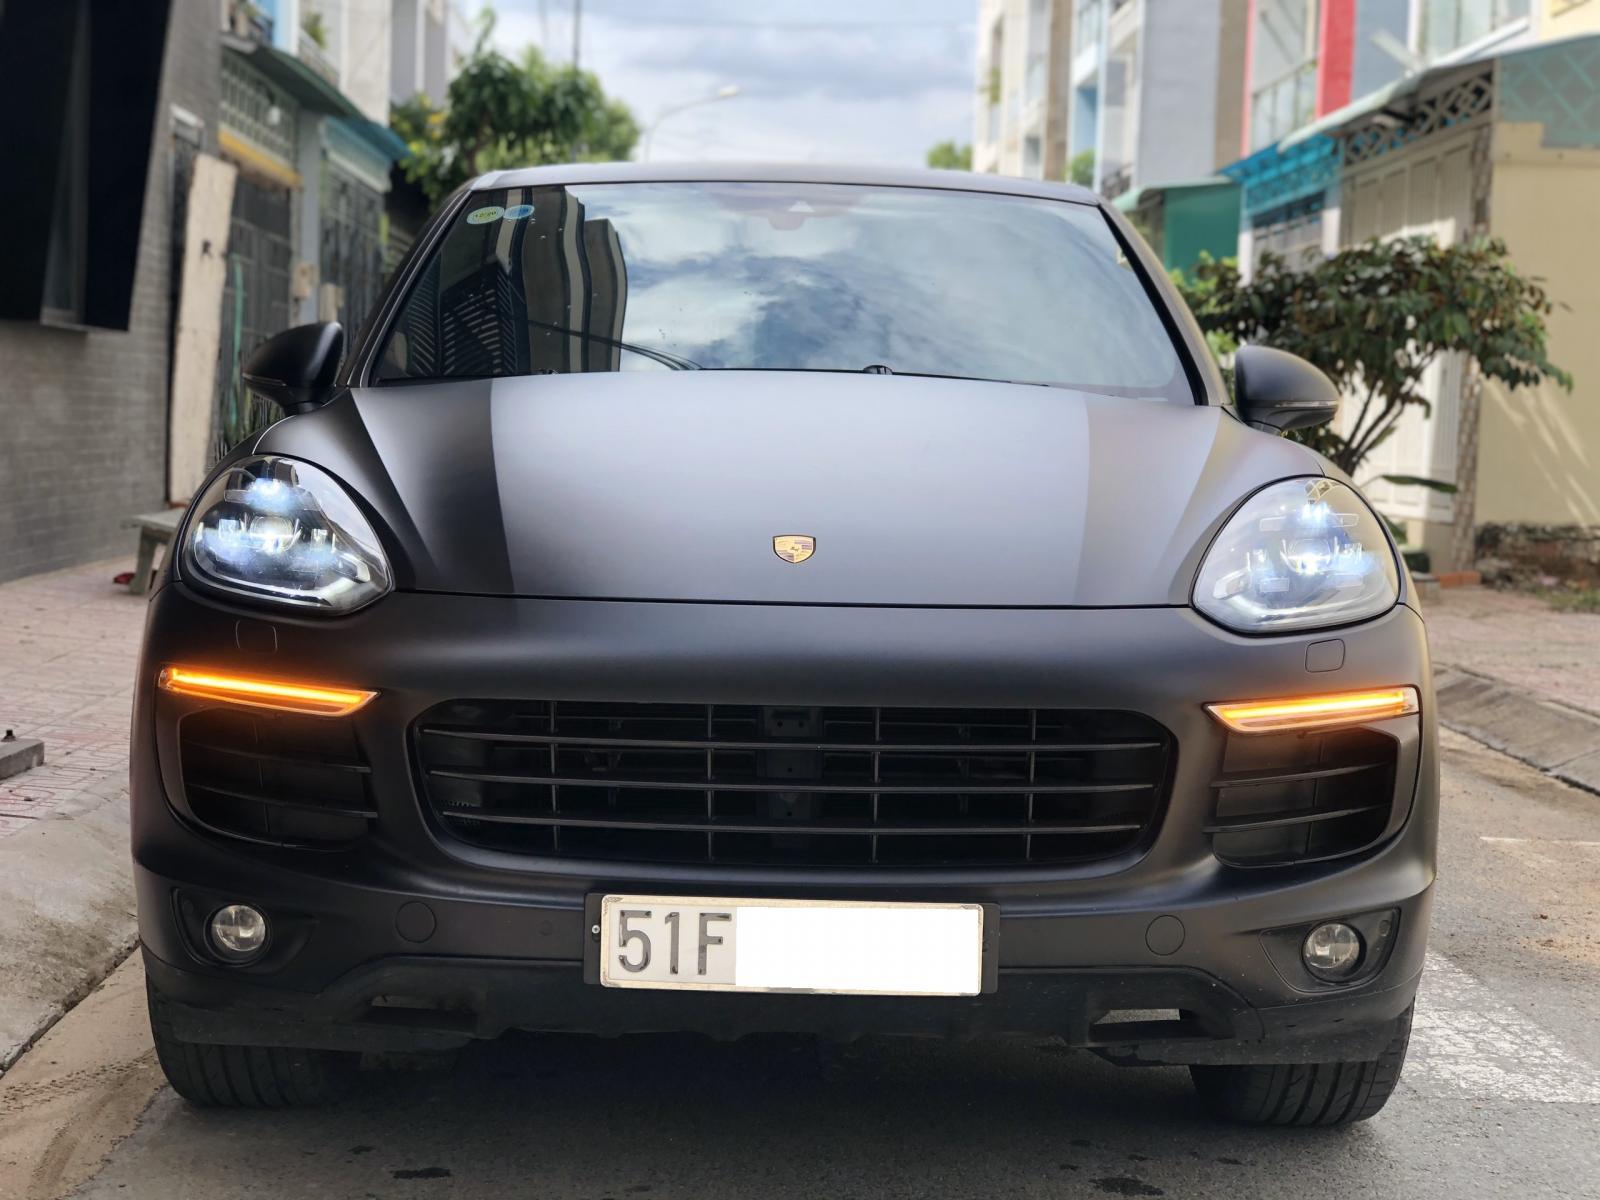 Cần bán xe Porsche Cayenne Turbo model 2015